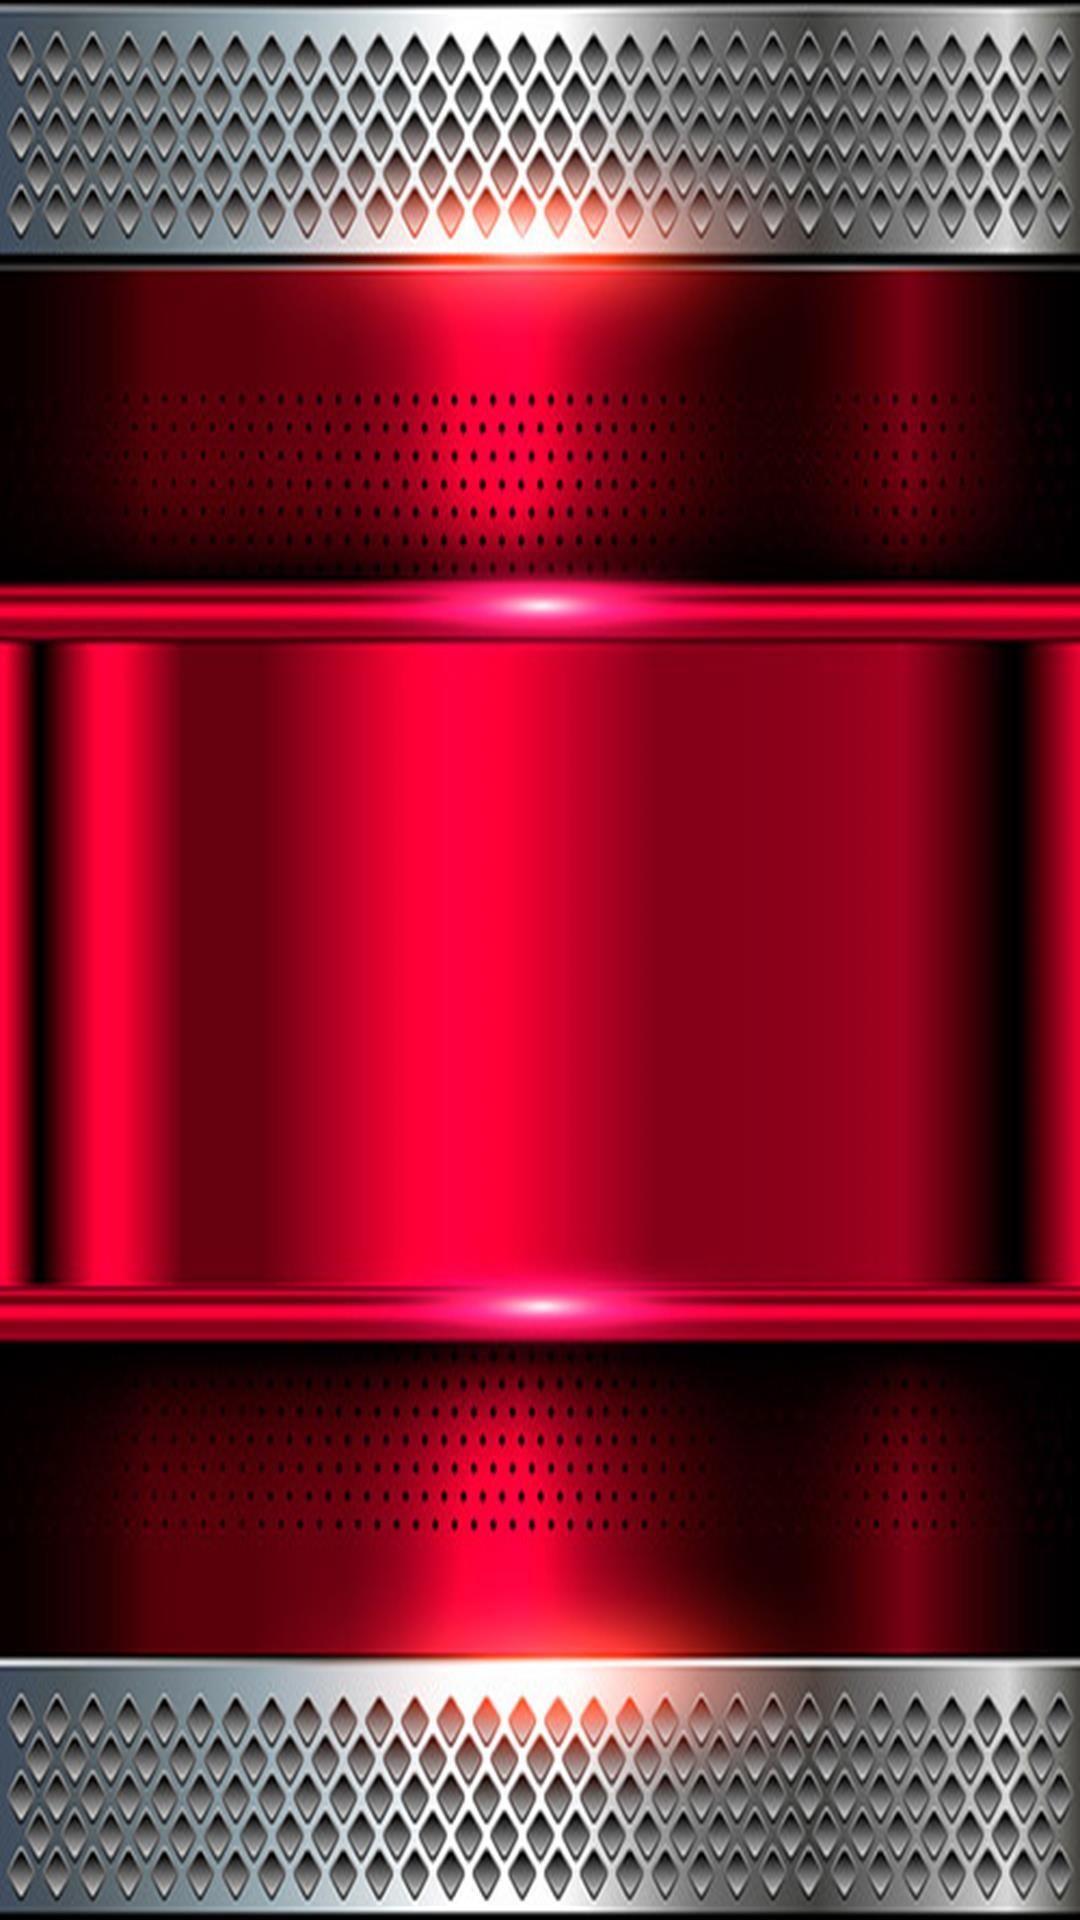 Samsung iPhone Edge PhoneTelefon 3D Wallpaper | Mobile ...